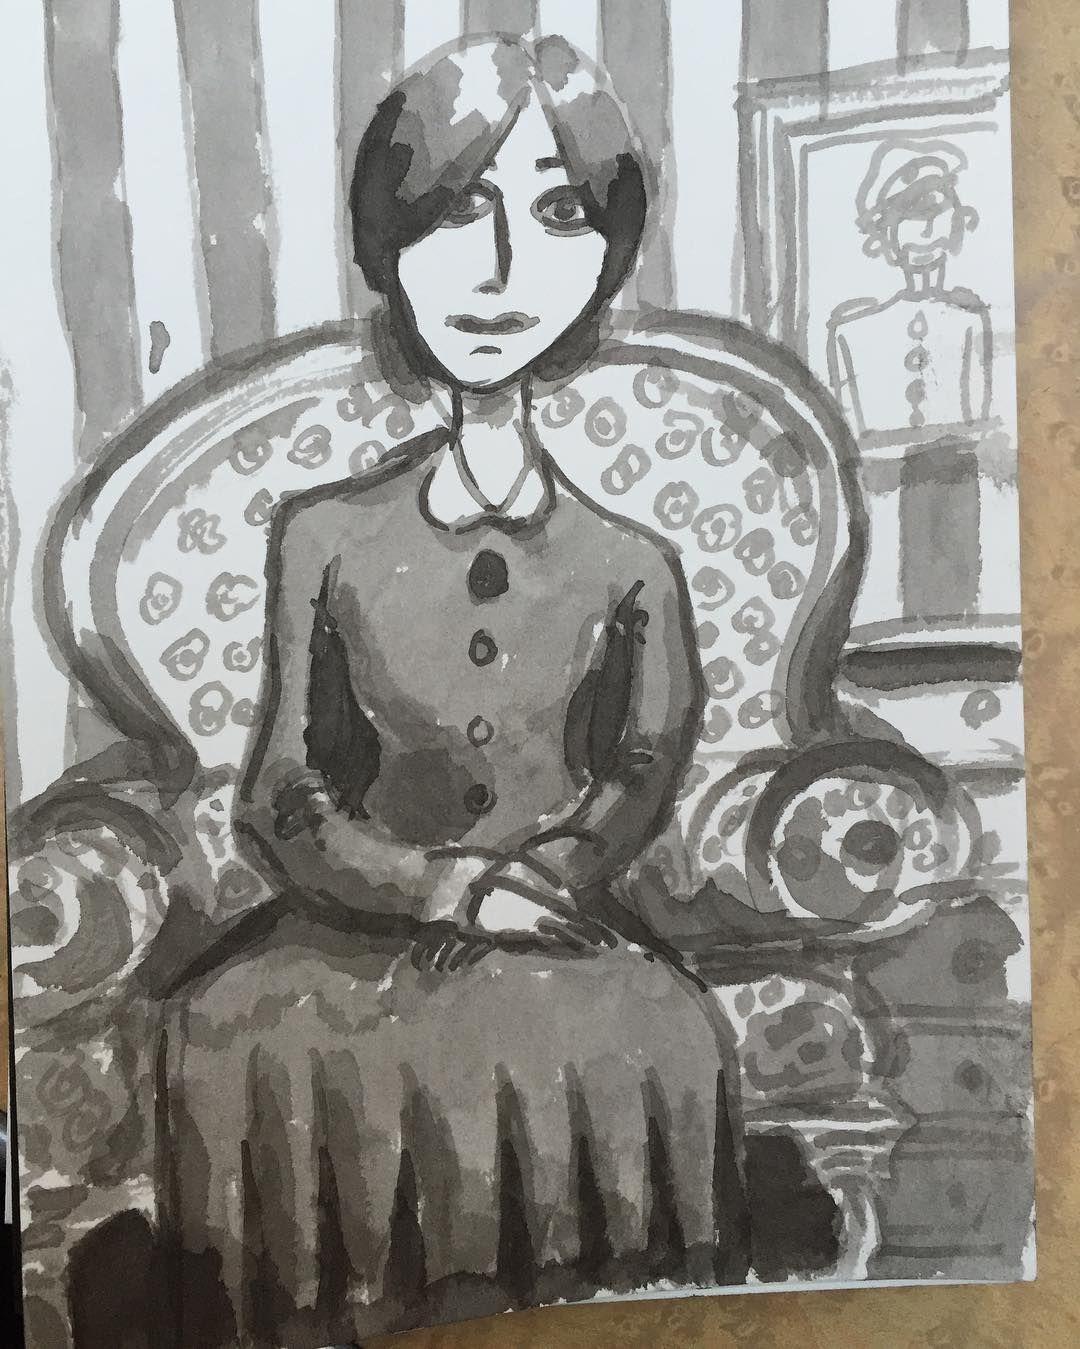 #woman #portrait #blackandwhite #vintage